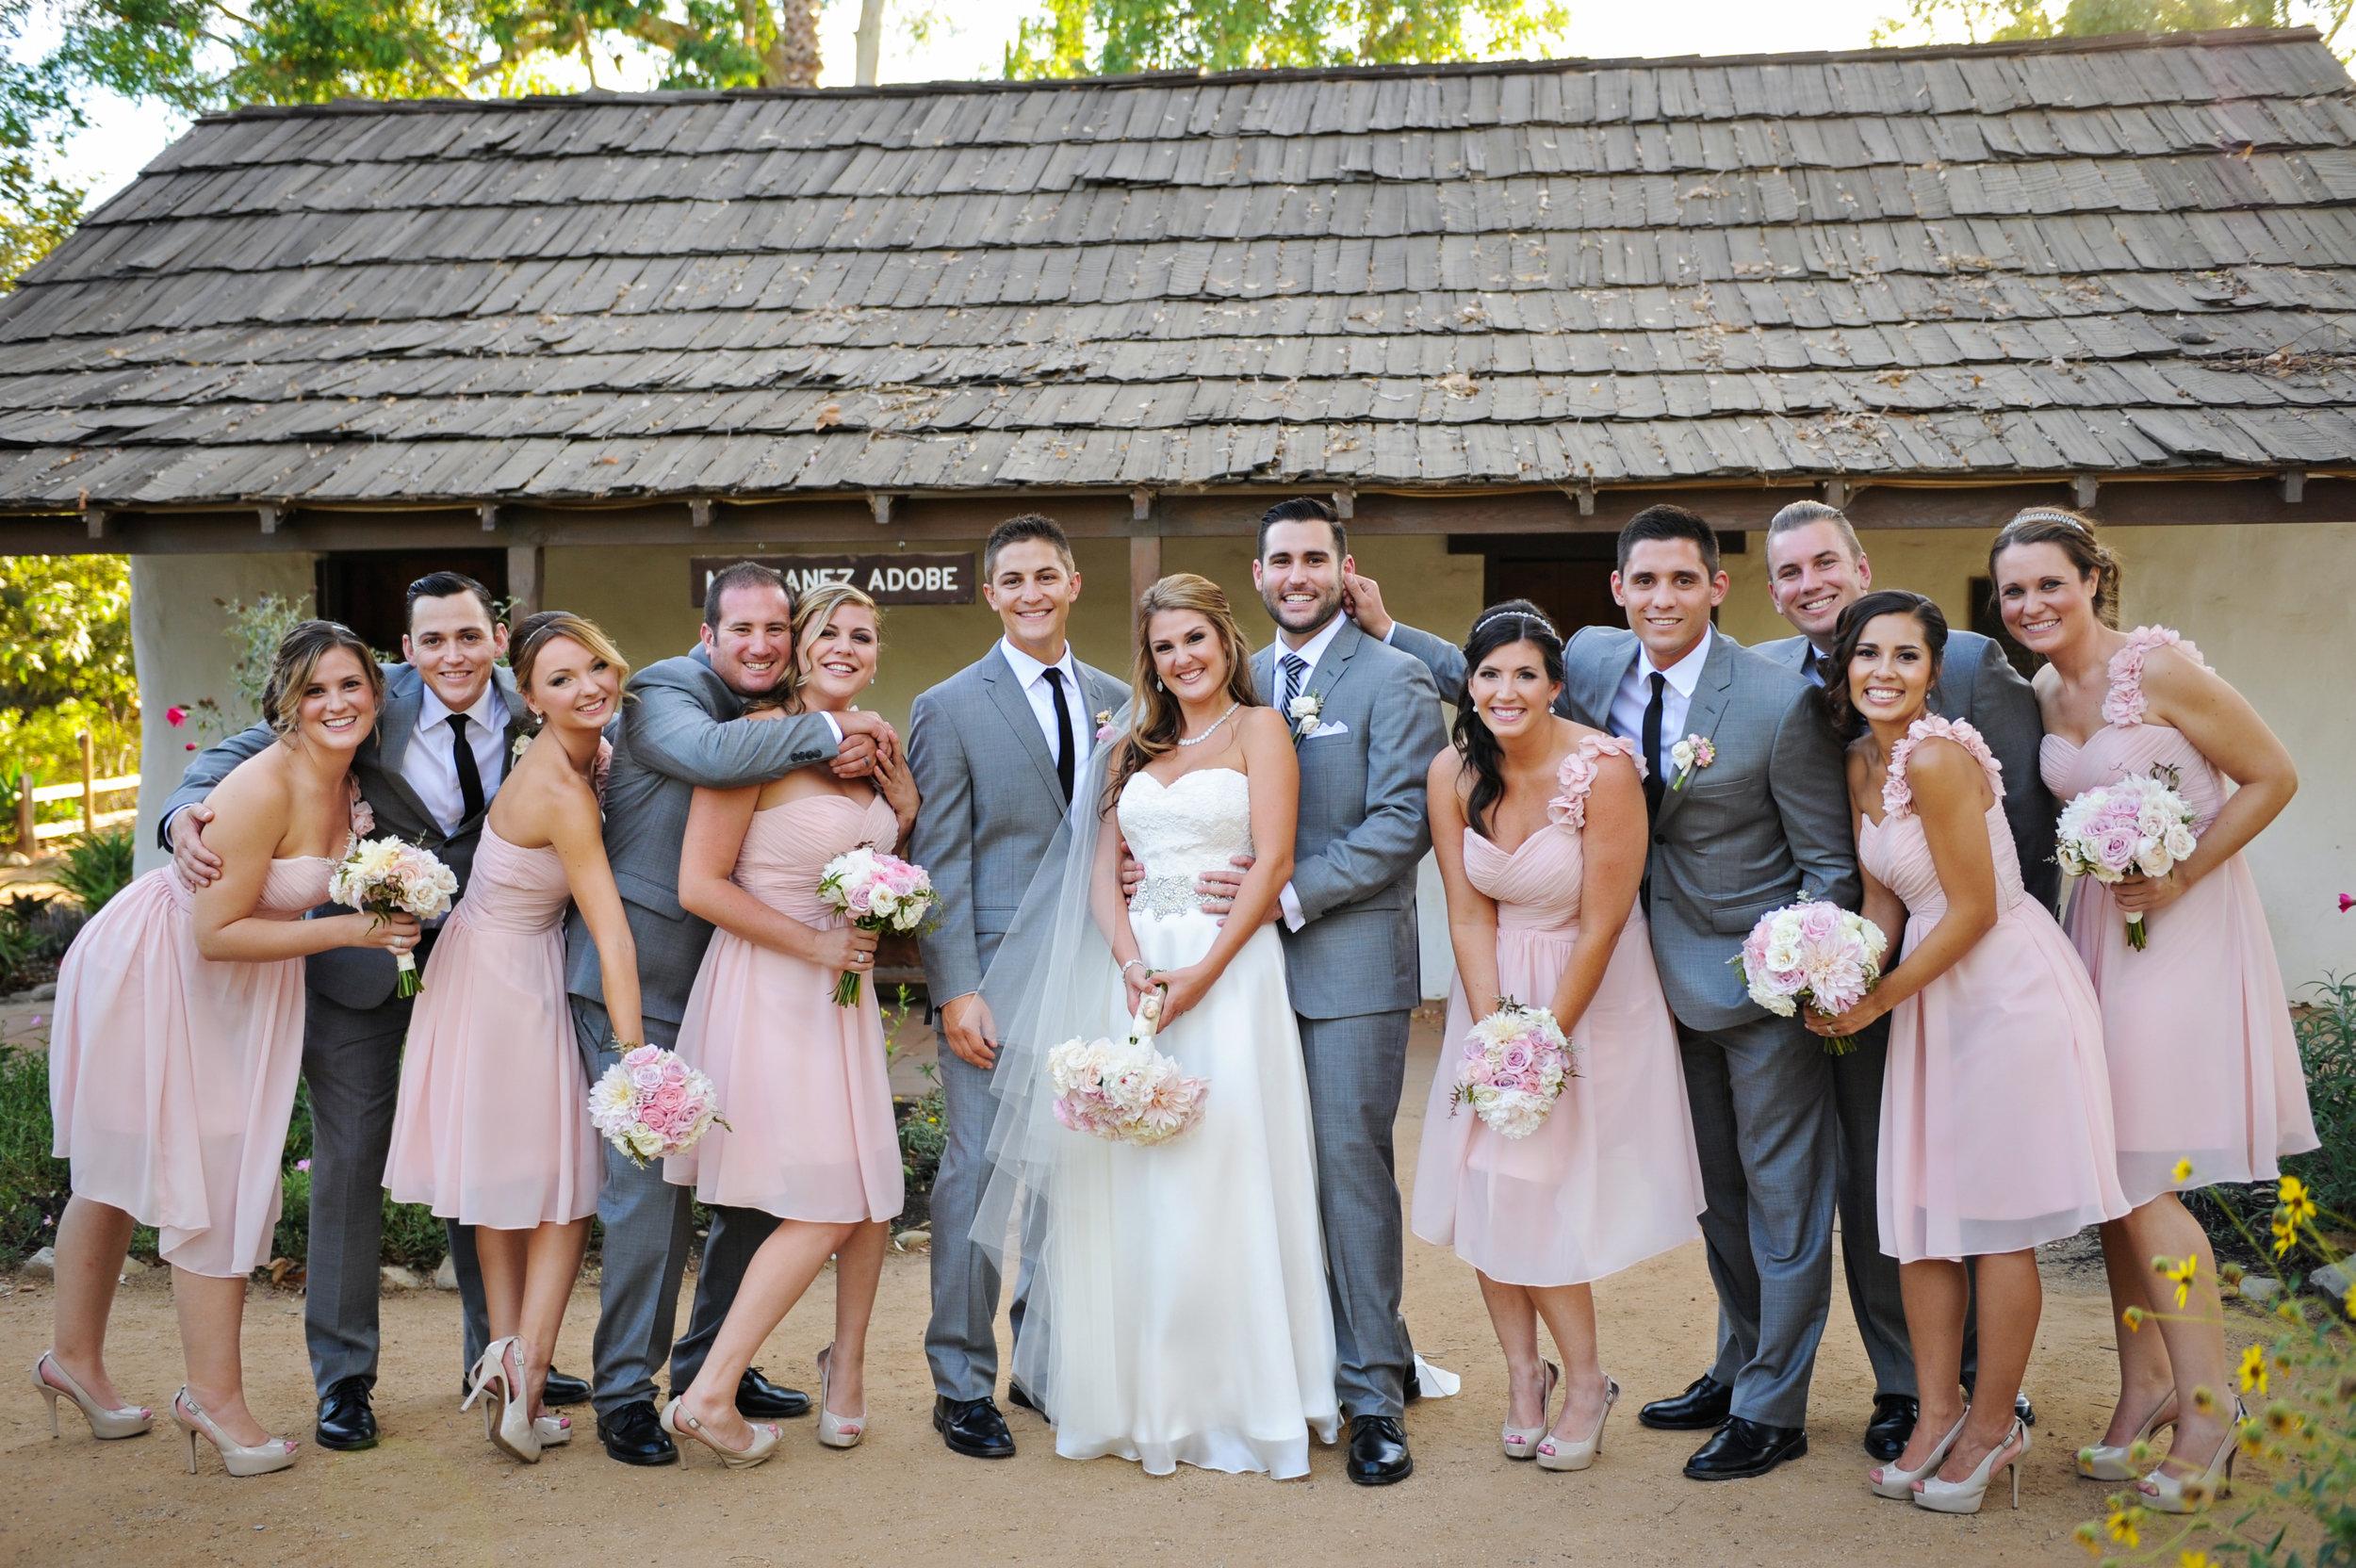 franciscan-gardens-wedding-6.jpg